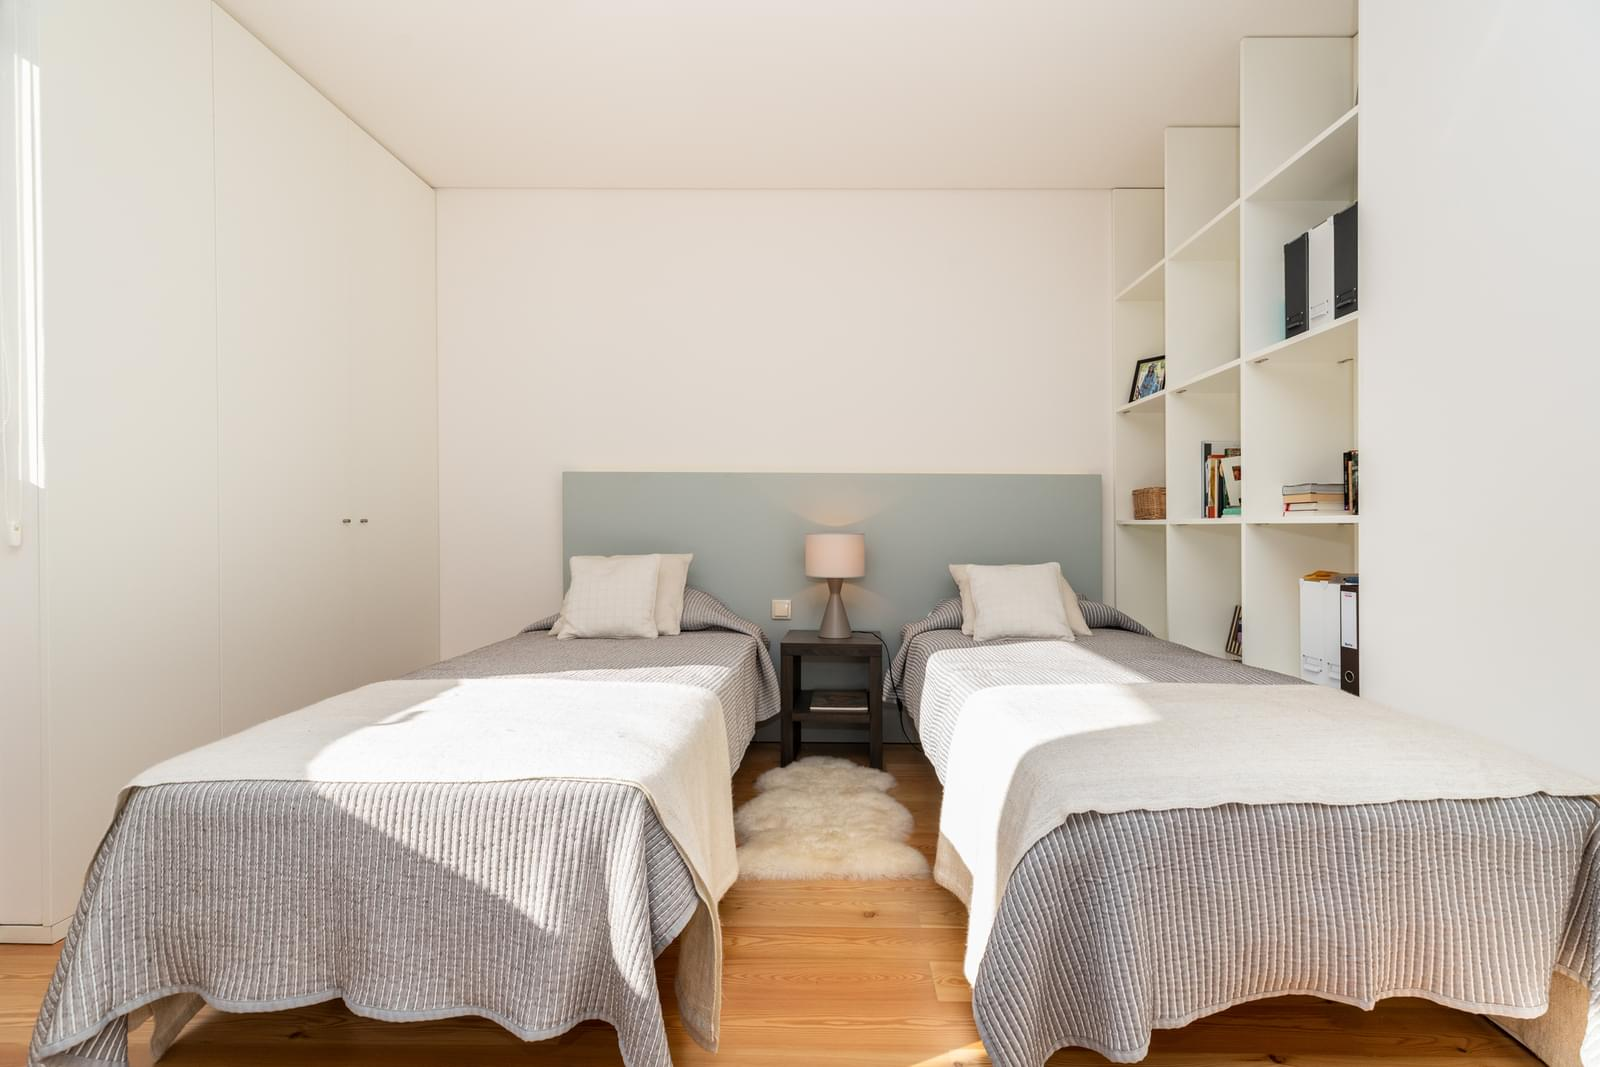 pf19126-apartamento-t2-lisboa-56518f40-c599-402c-a272-4d5b7ec25f8e